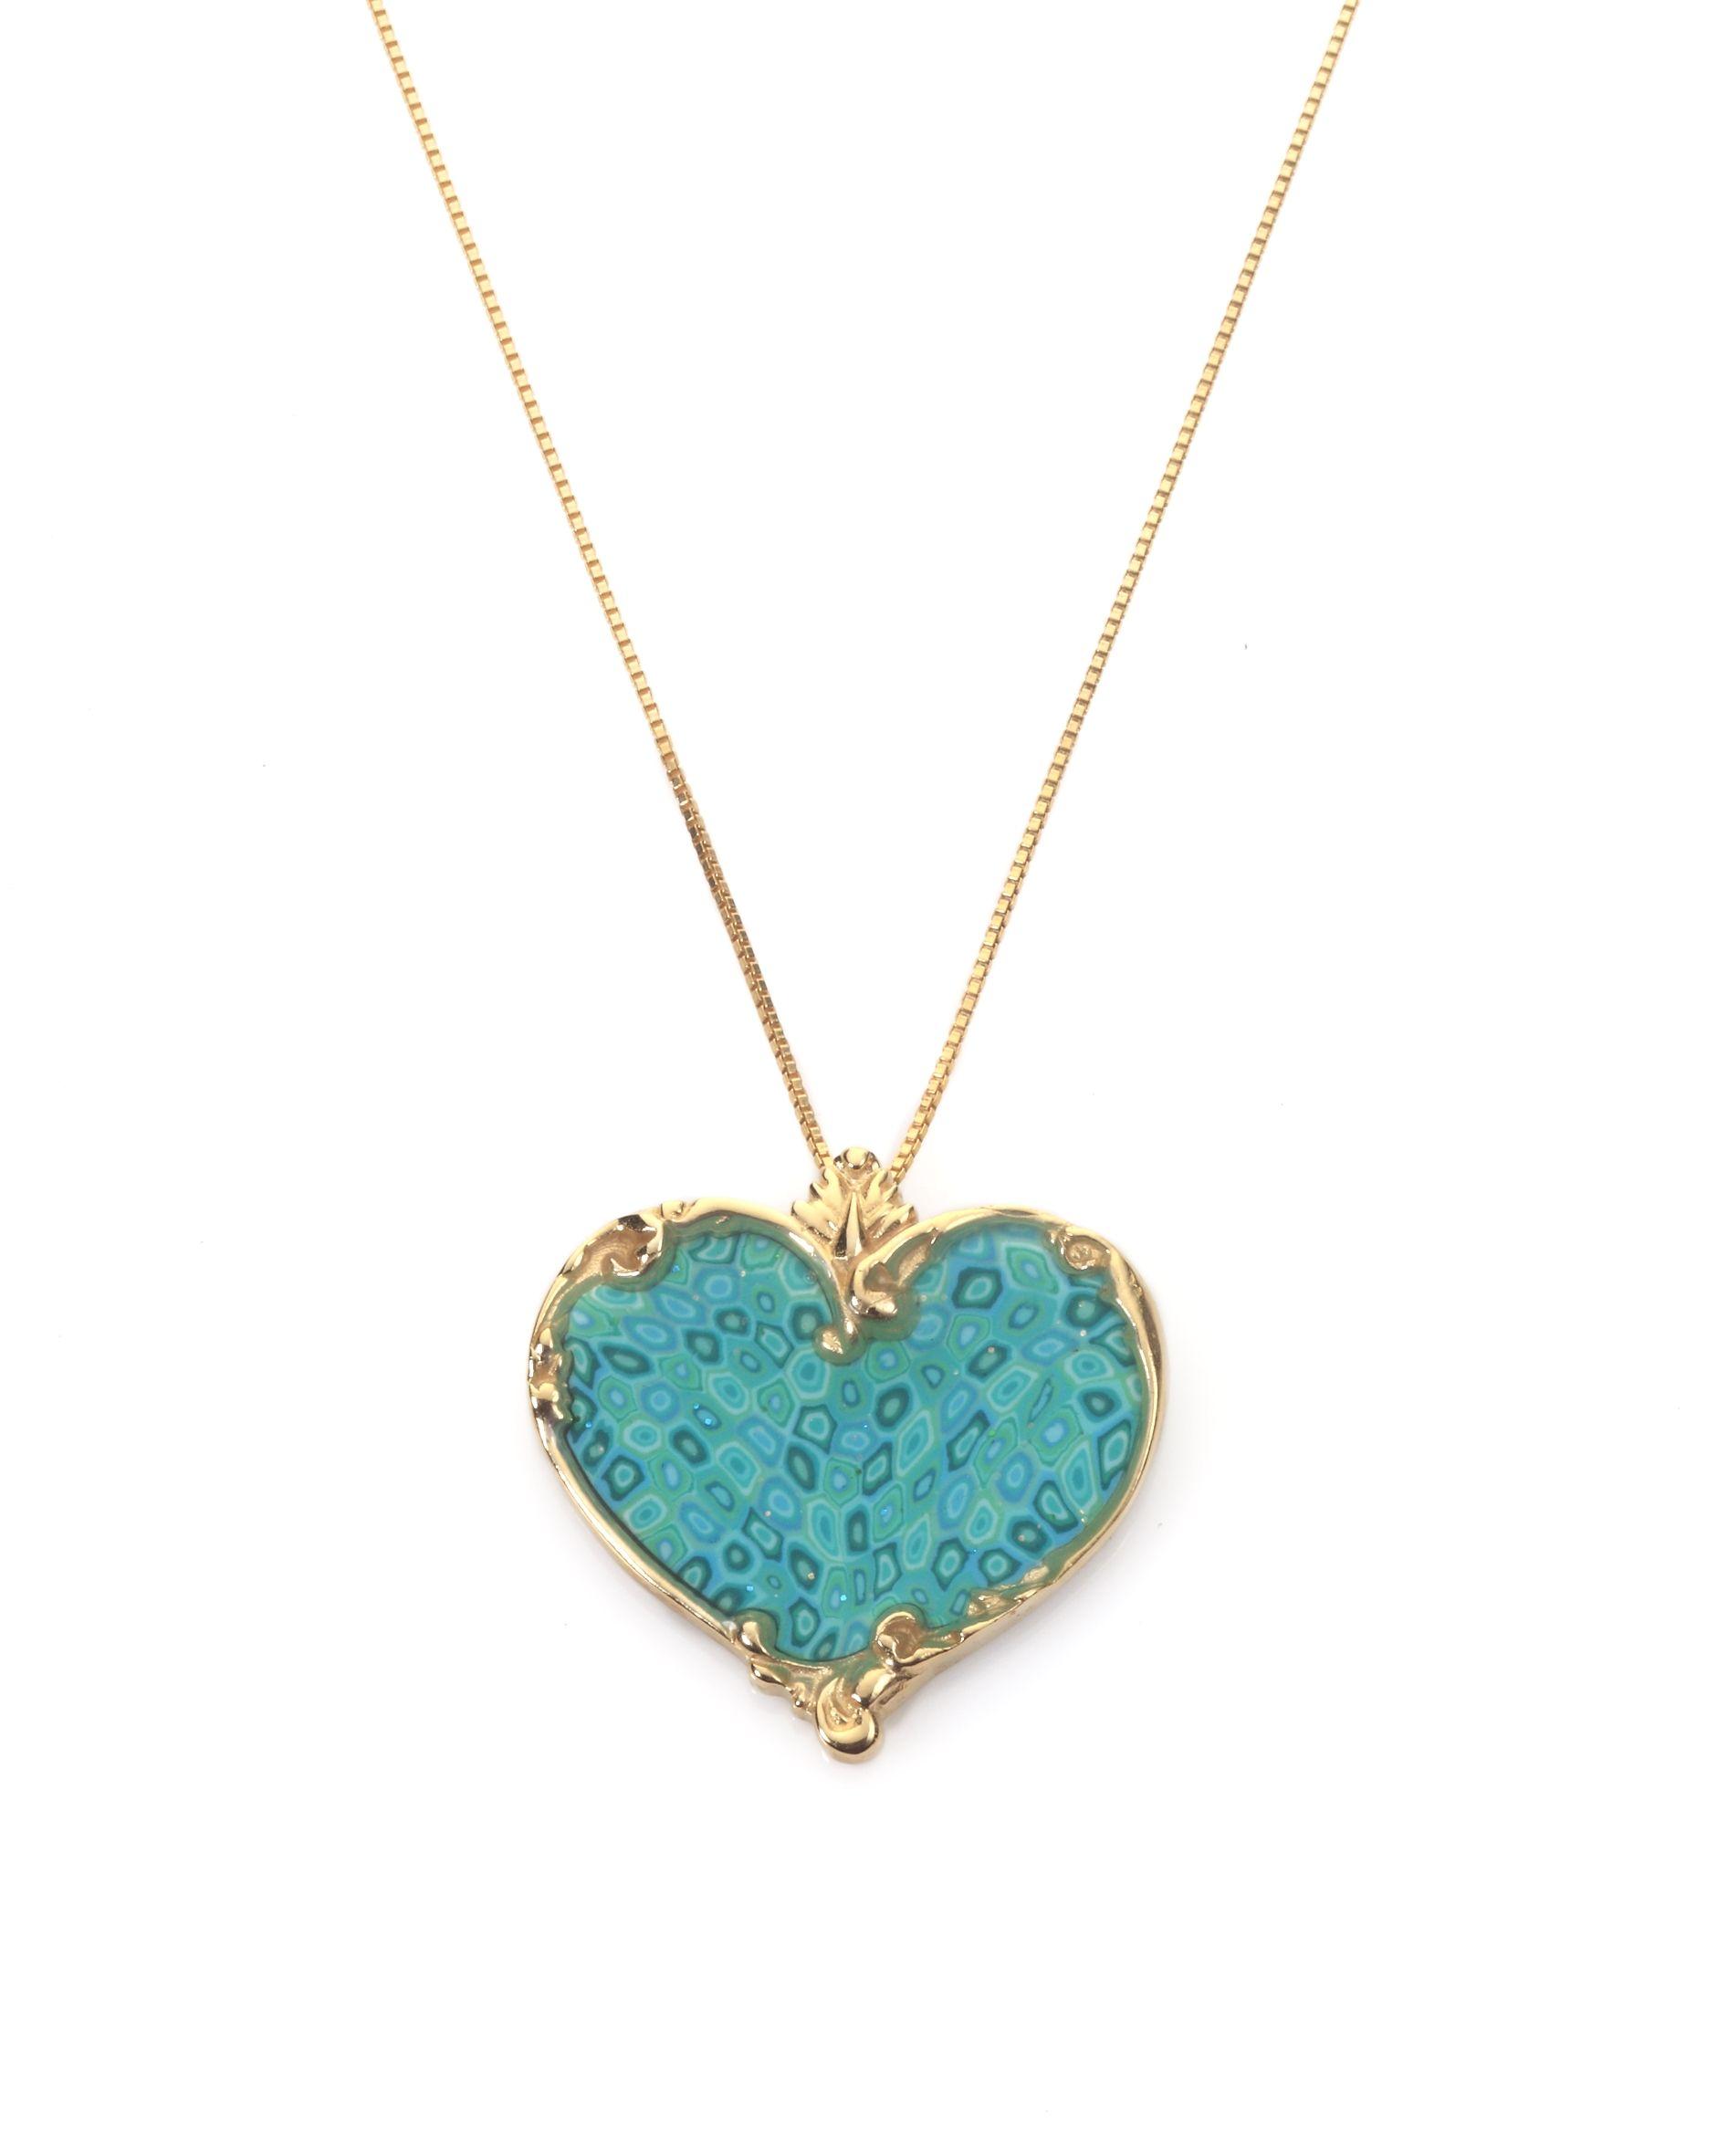 Heart Pendants Necklaces HEARTS LOVE Pinterest